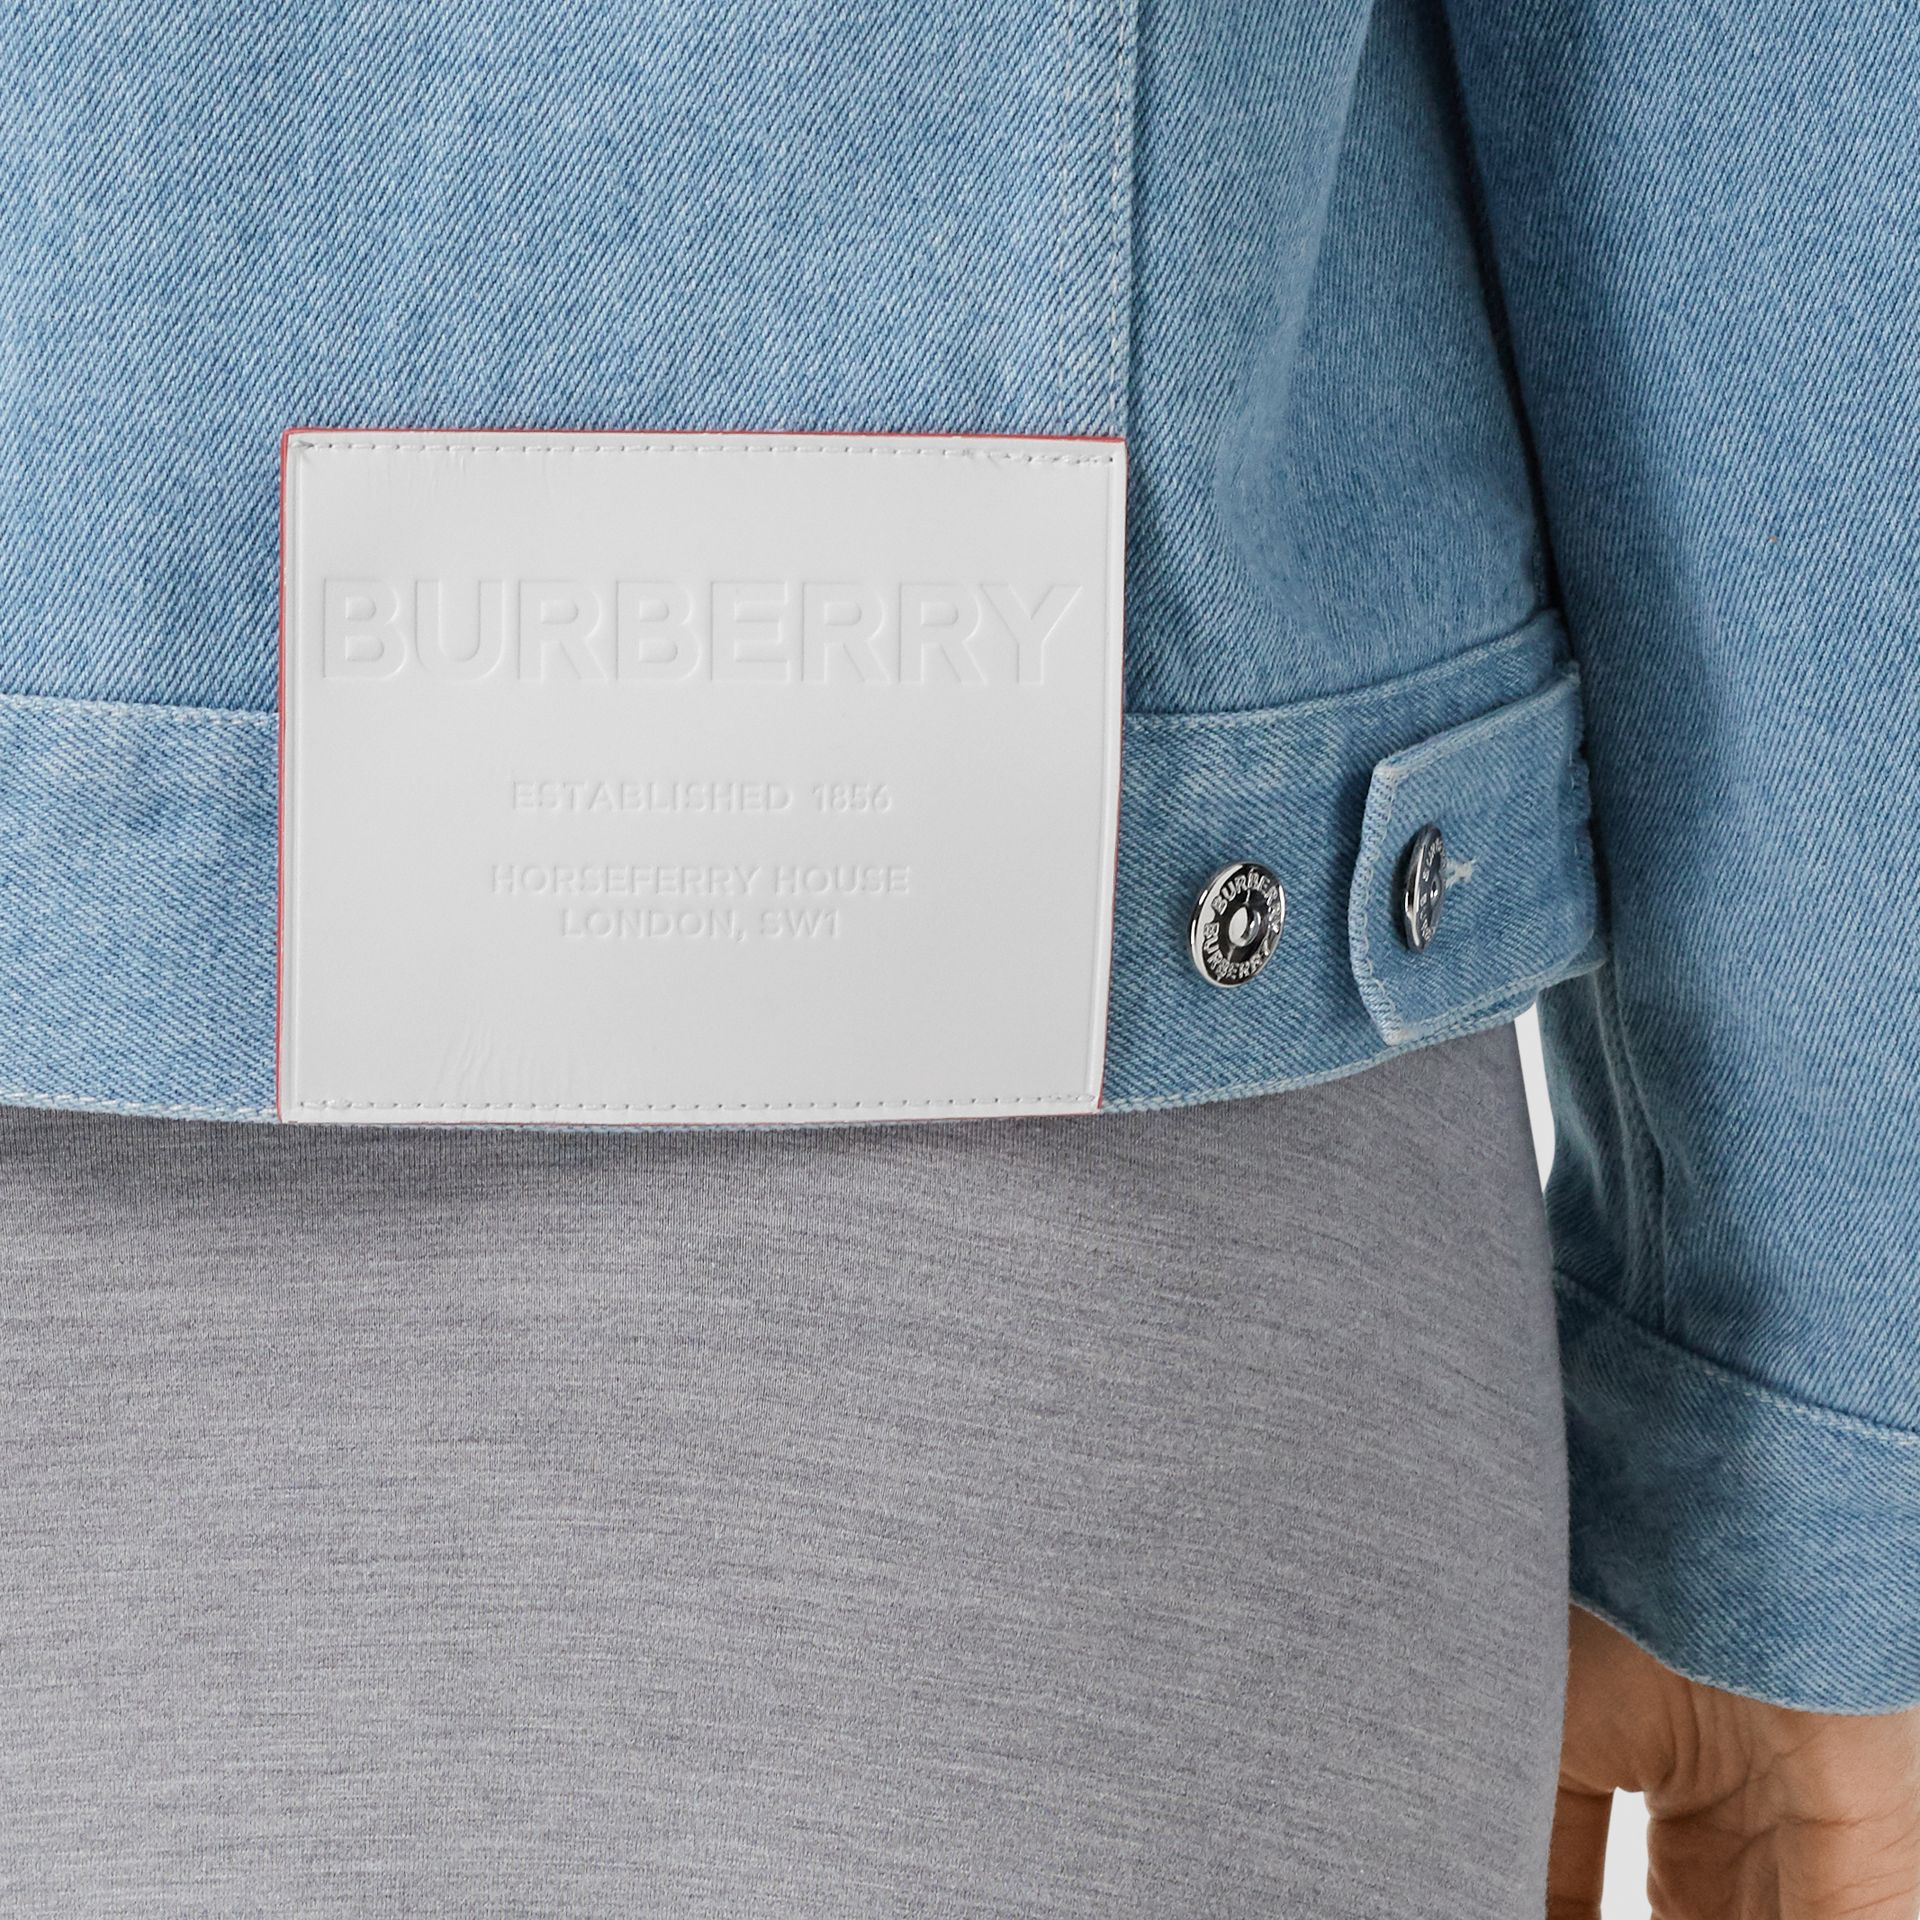 Horseferry Print Bleached Denim Jacket in Light Indigo - Women | Burberry Singapore - gallery image 5